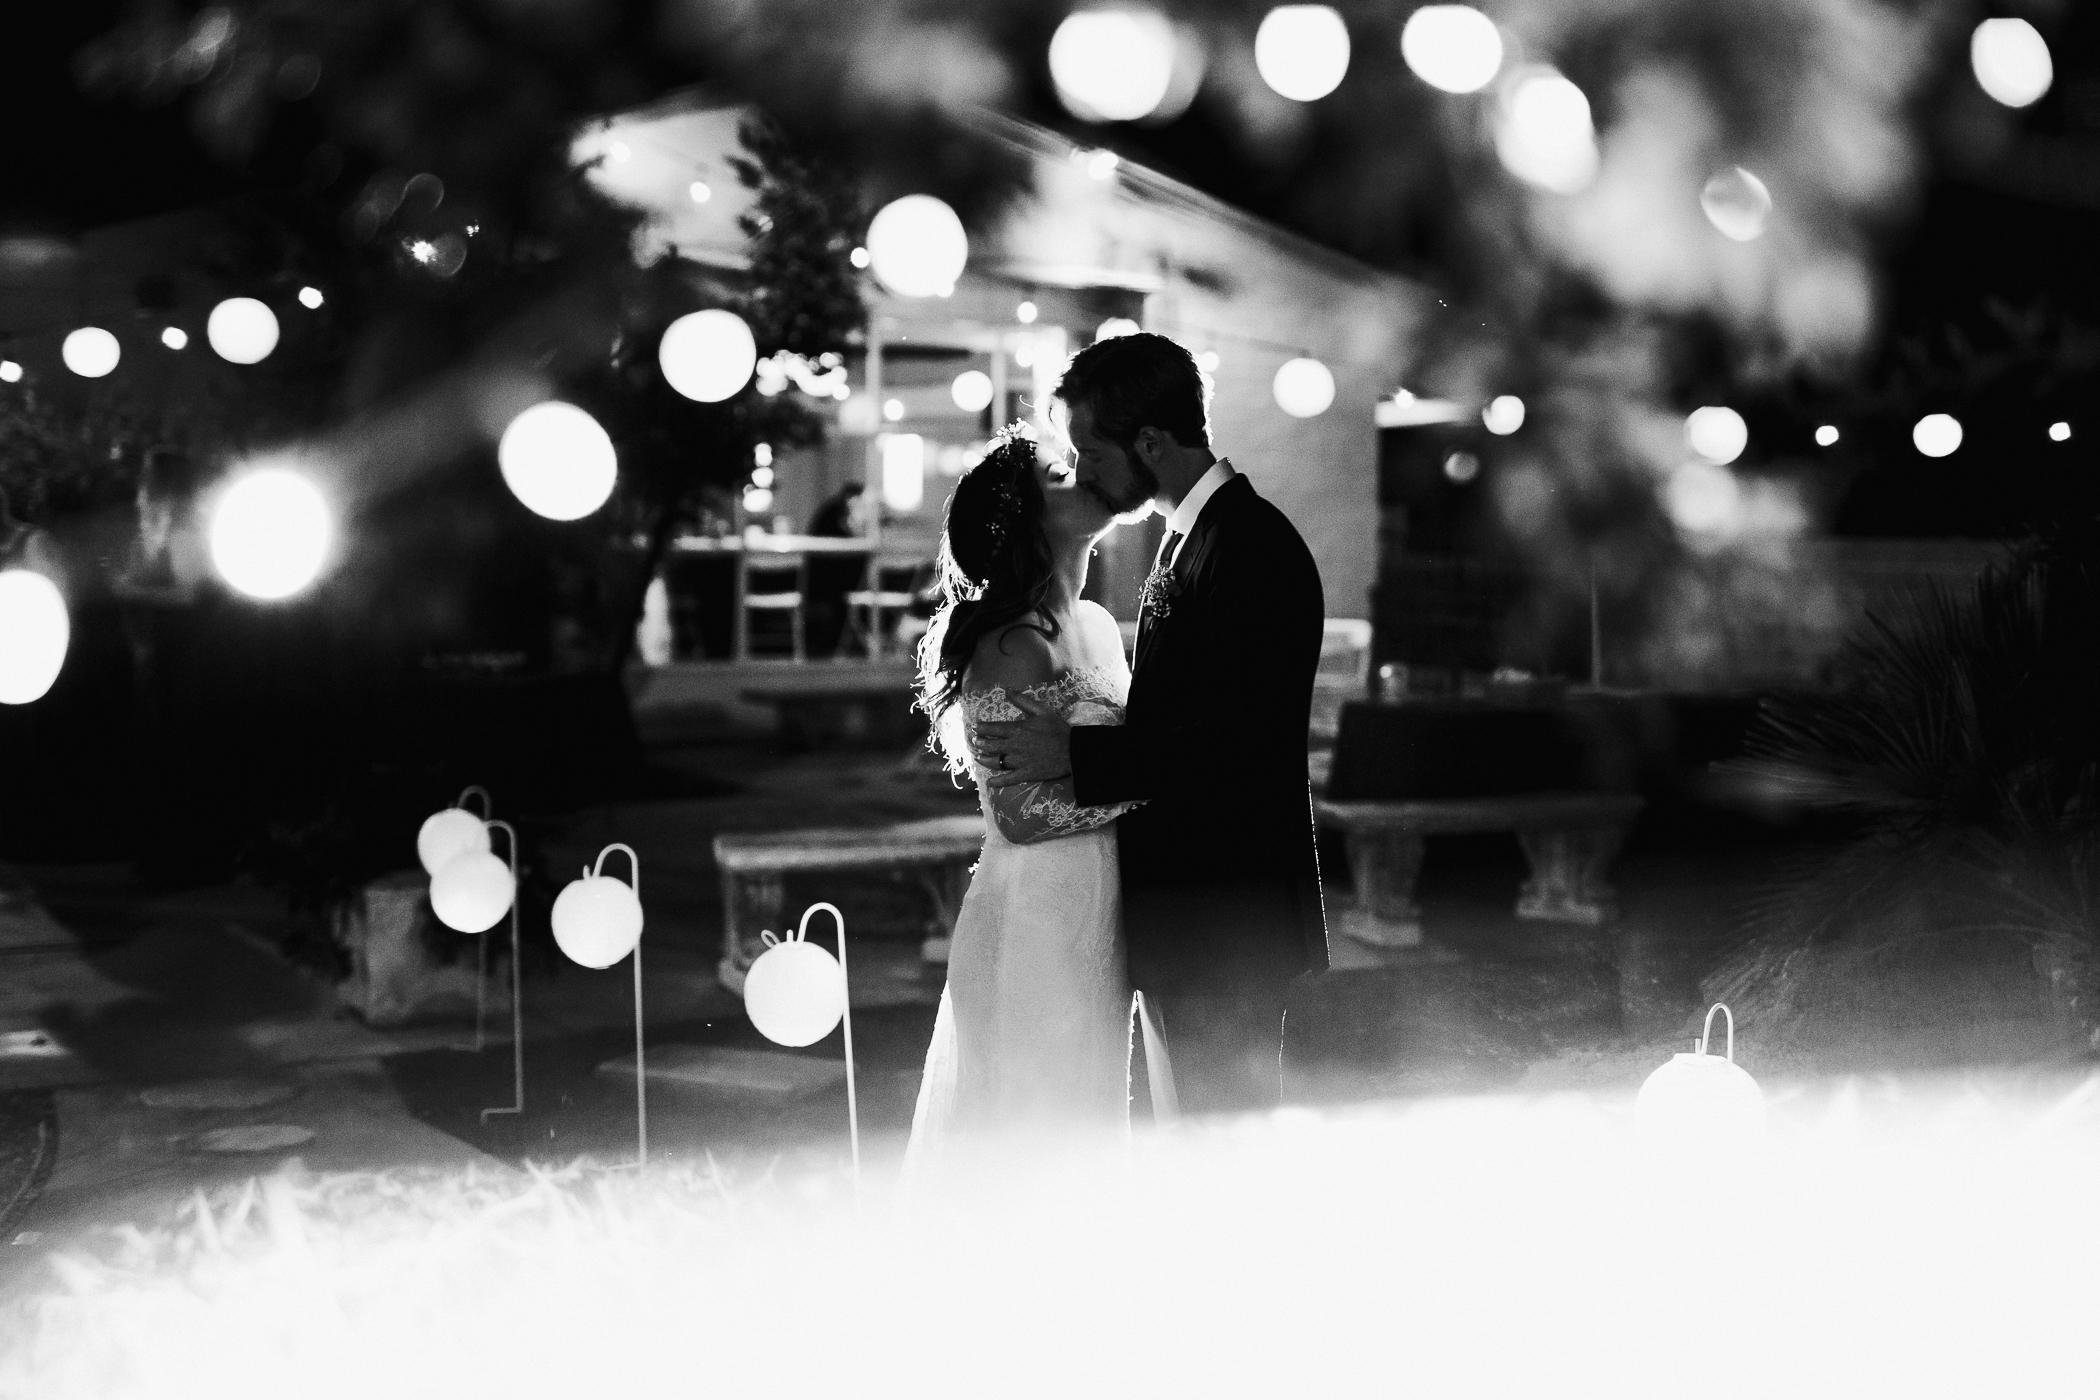 181104-Luxium-Weddings-Arizona-@matt__Le-Brandon-Kariana-Phoenix-Valley-Garden-Center-1153.jpg